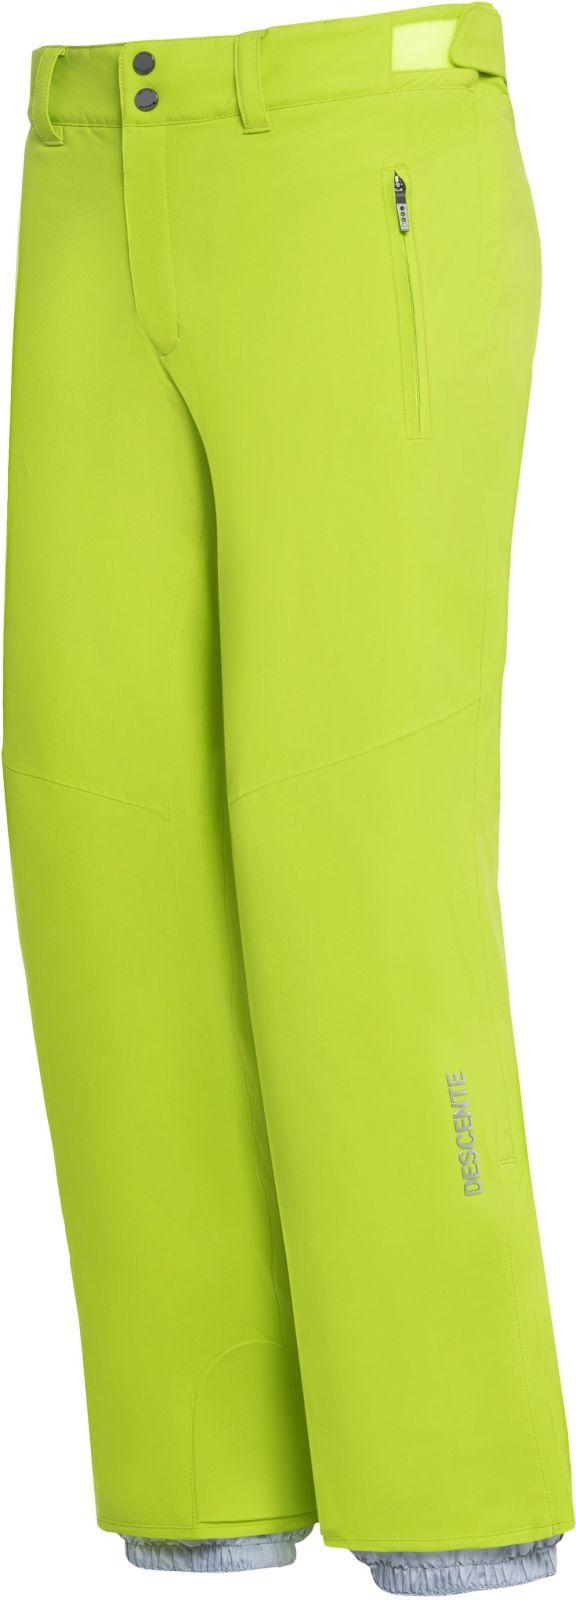 Descente Roscoe Pants - lime green XXL